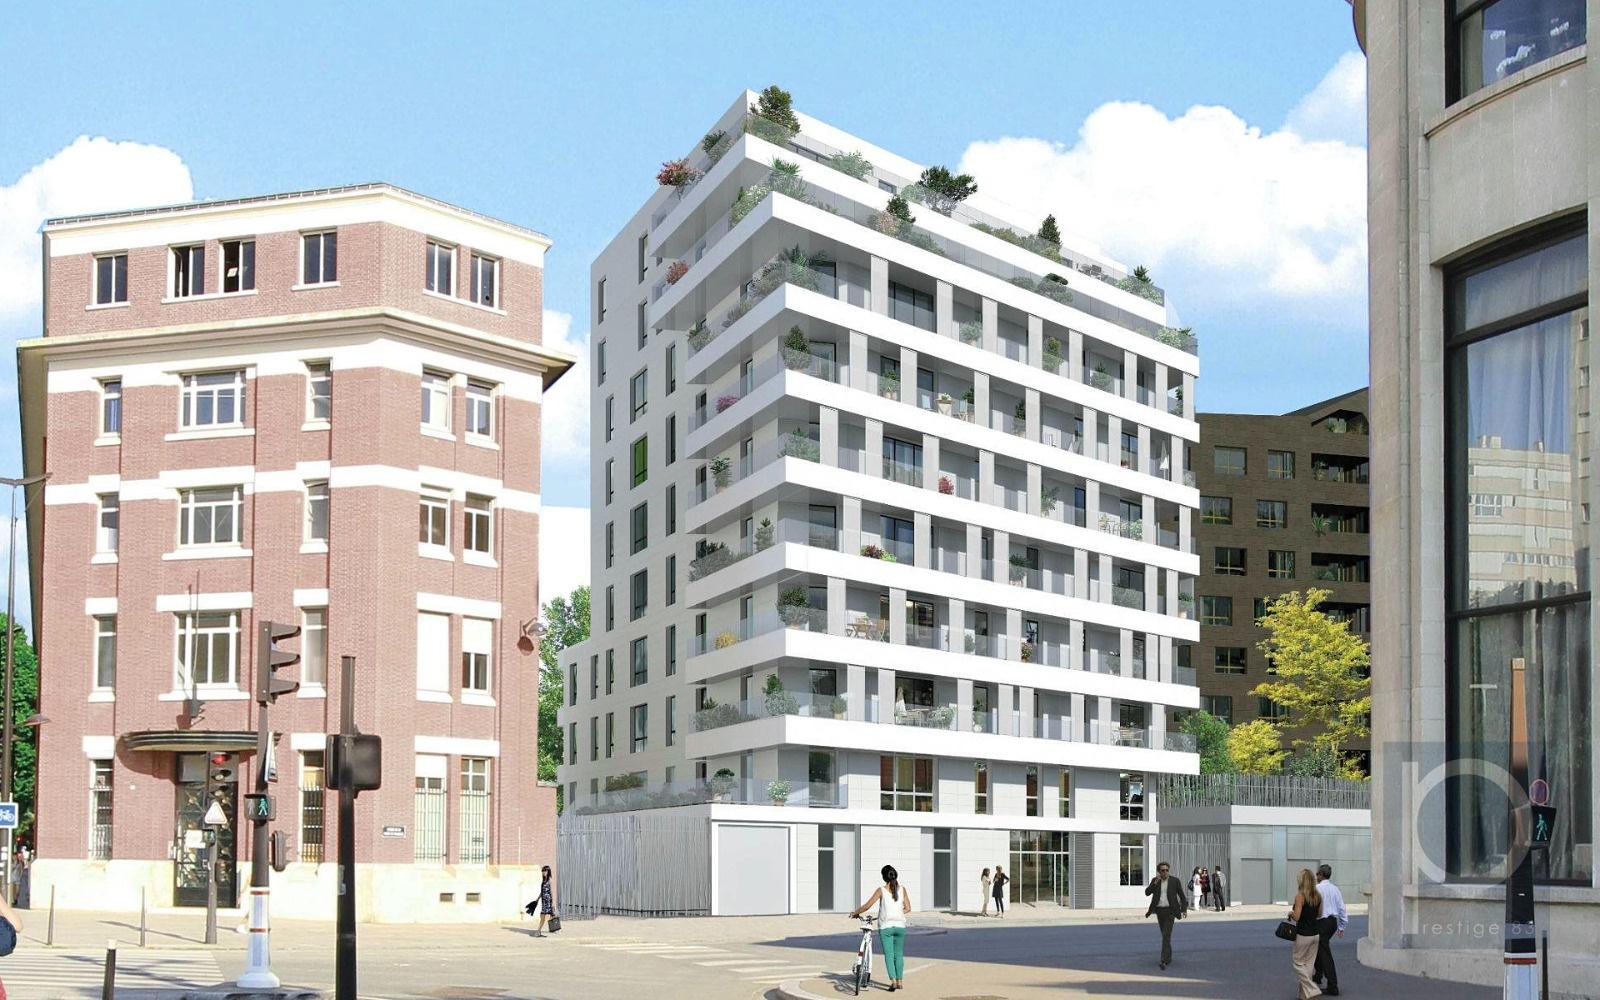 Vente appartement paris vaugirard 15e arrondissement 75015 for Vente appartement paris